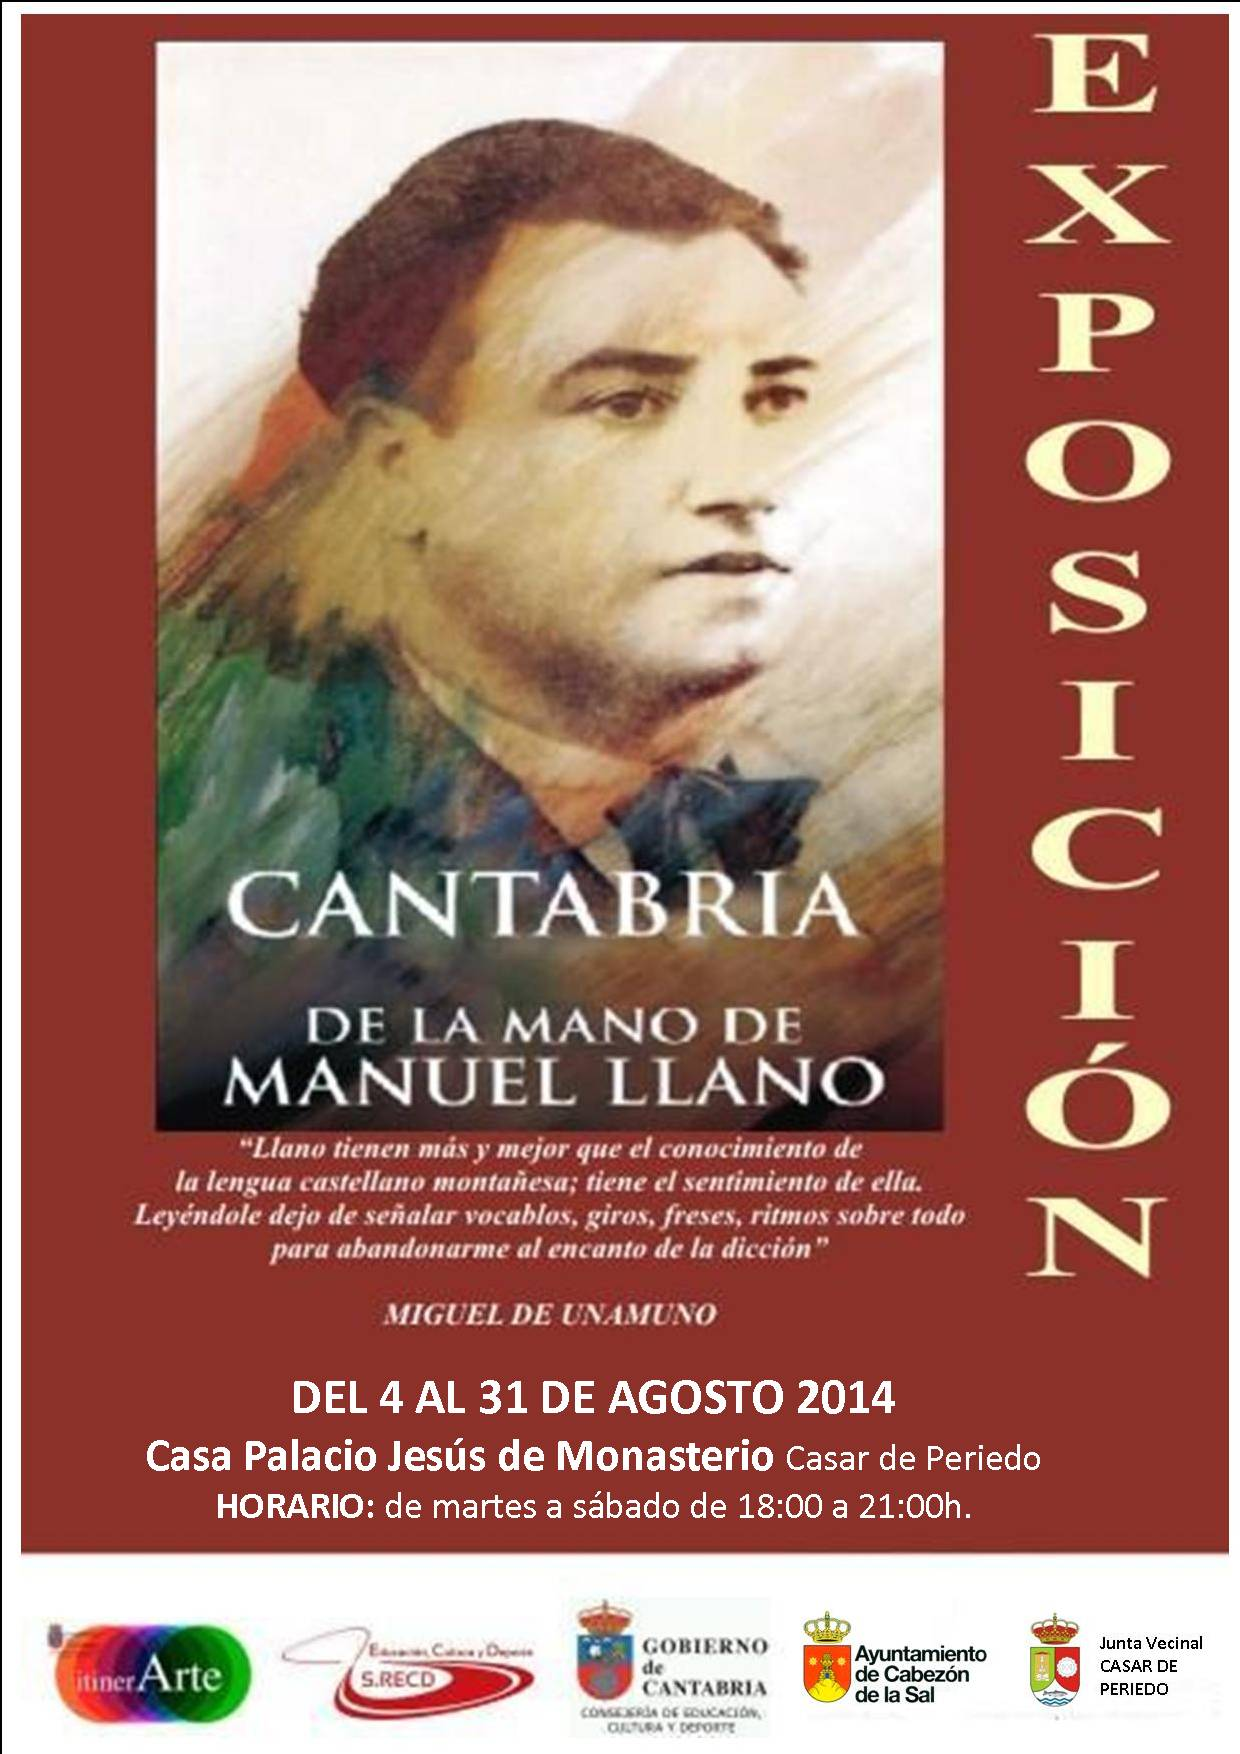 http://www.cabezondelasal.net/wp-content/uploads/2014/07/expo-manuel-llano.jpg